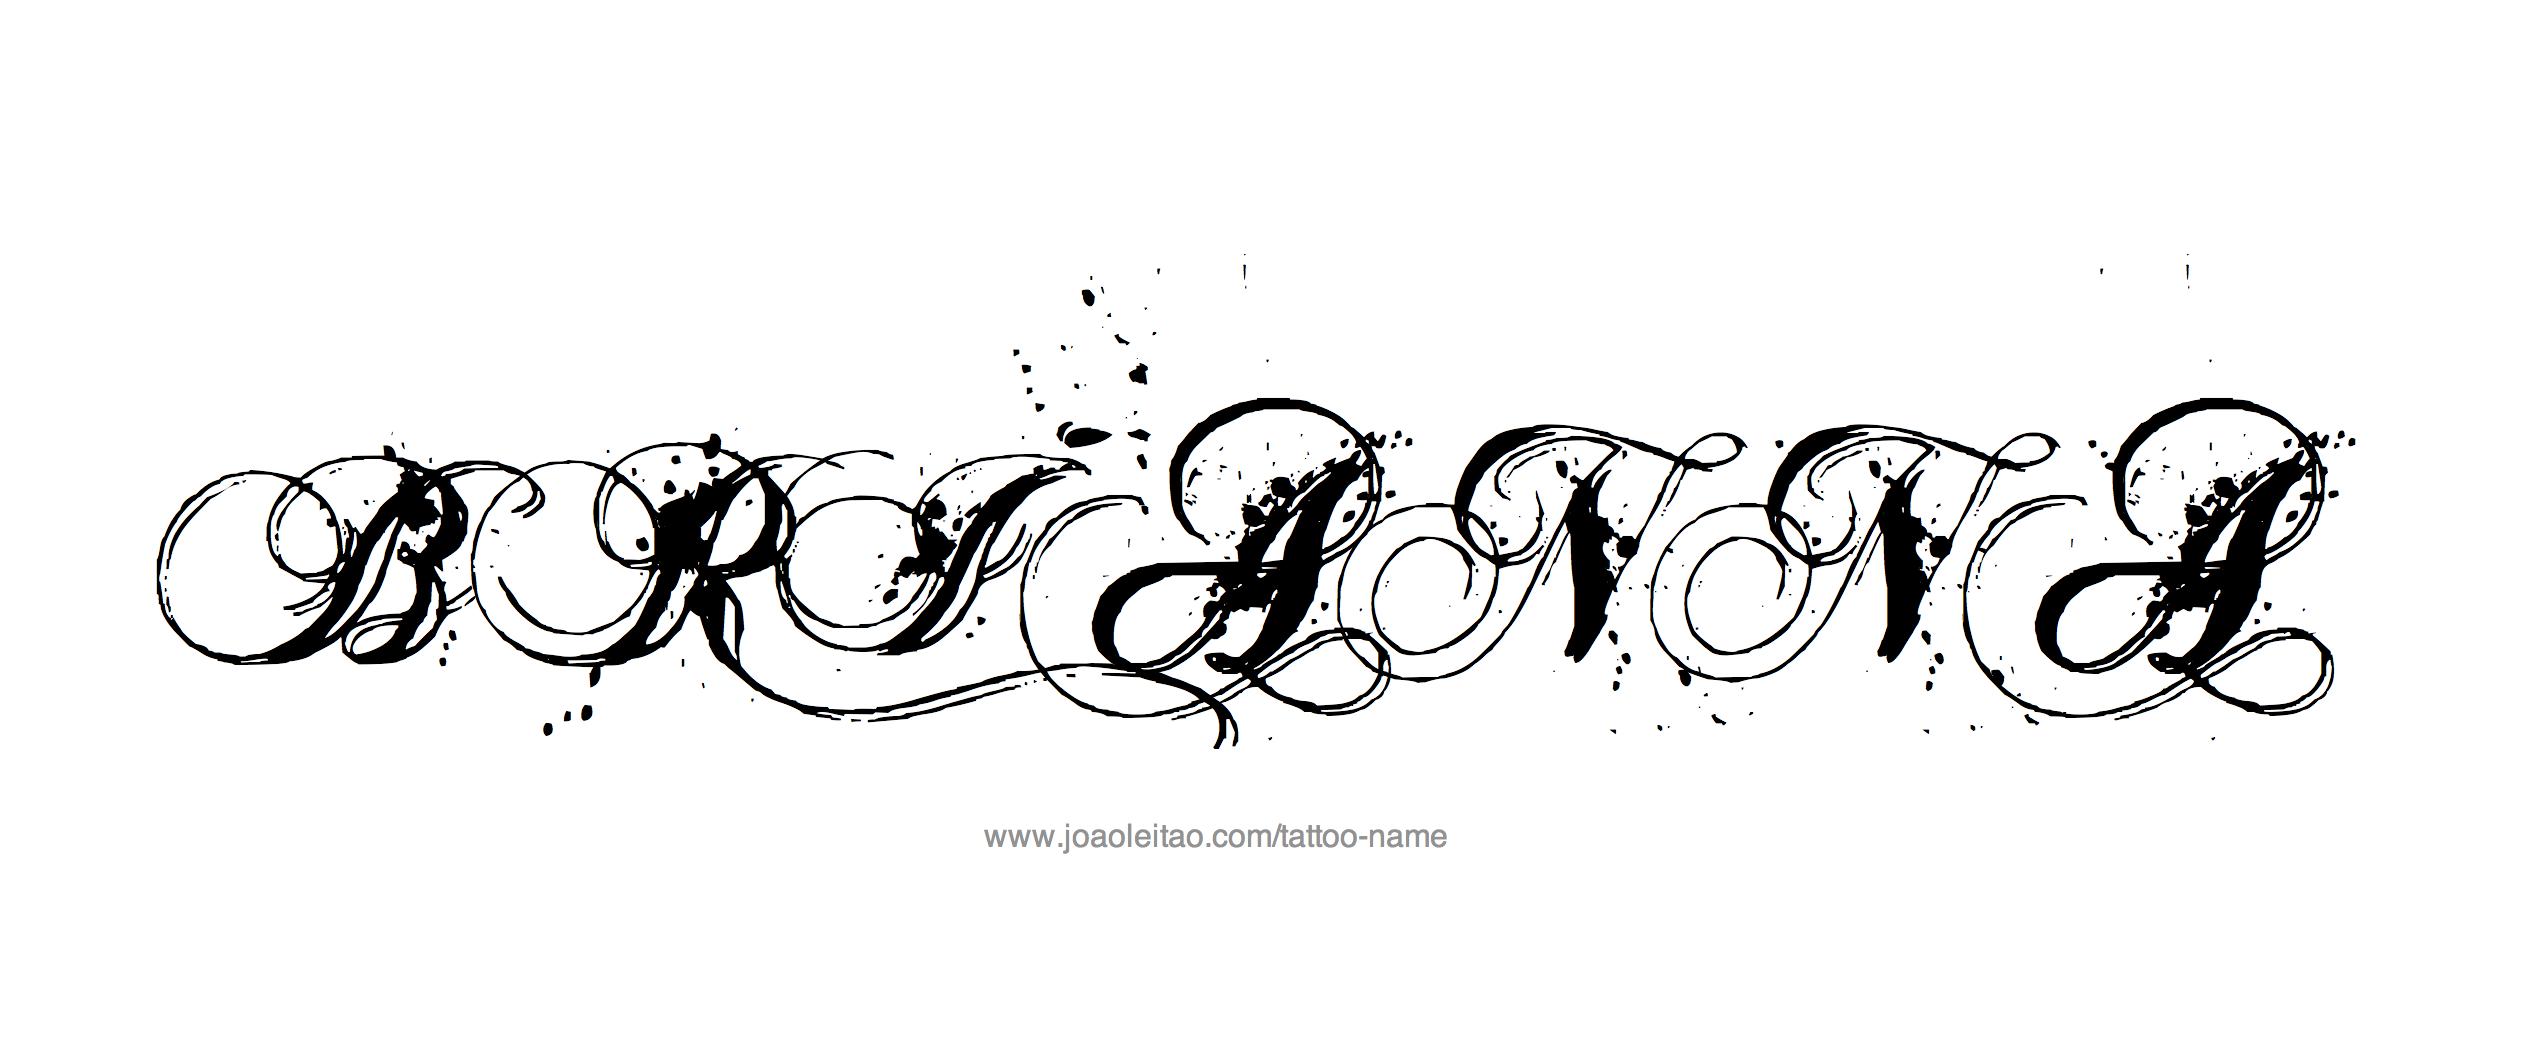 Name tattoo designs free - Tattoo Design Name Brianna